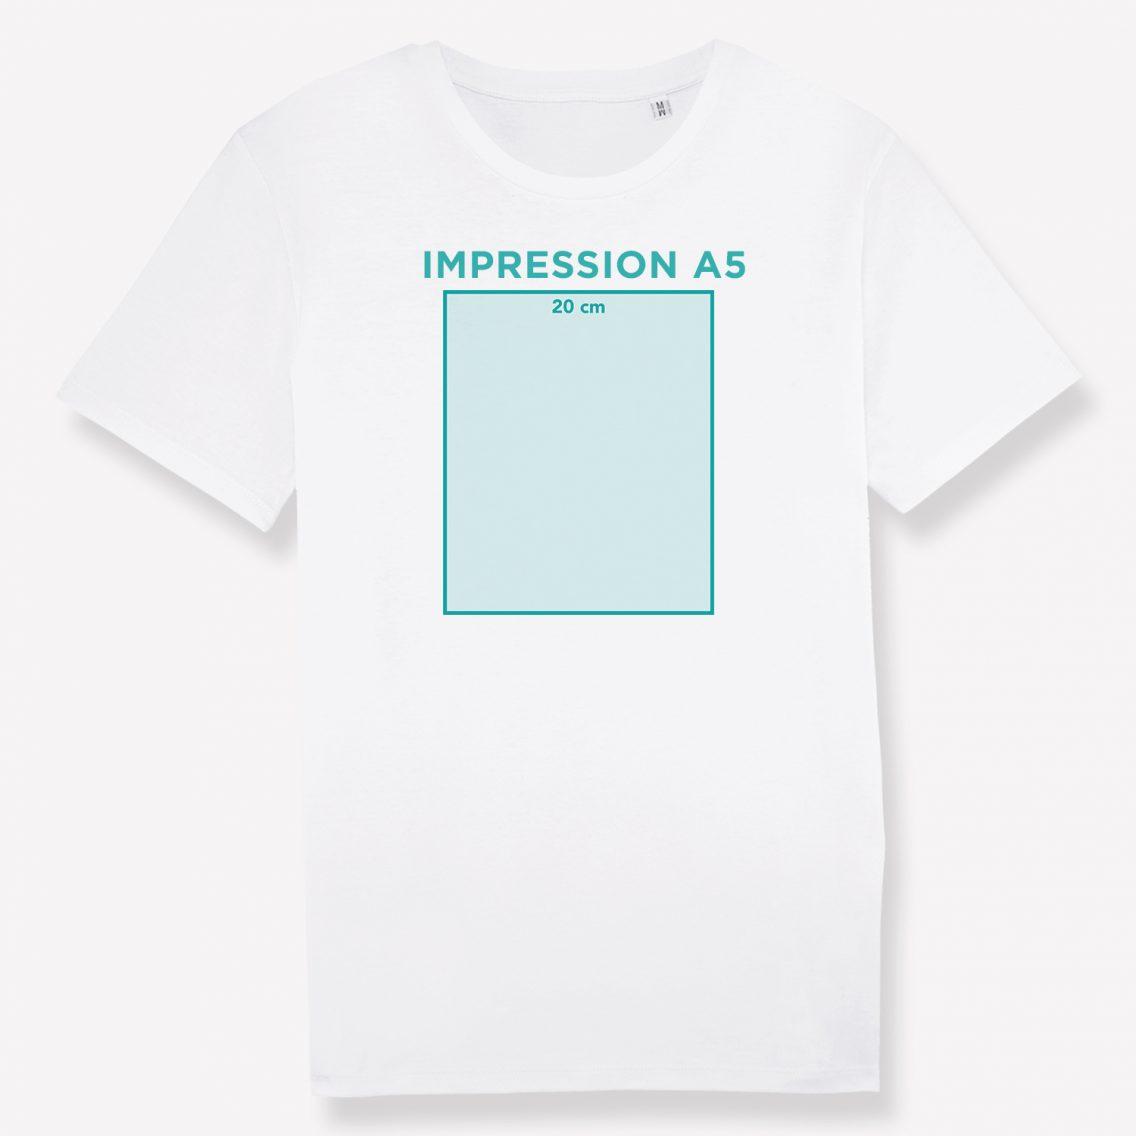 Impression A5